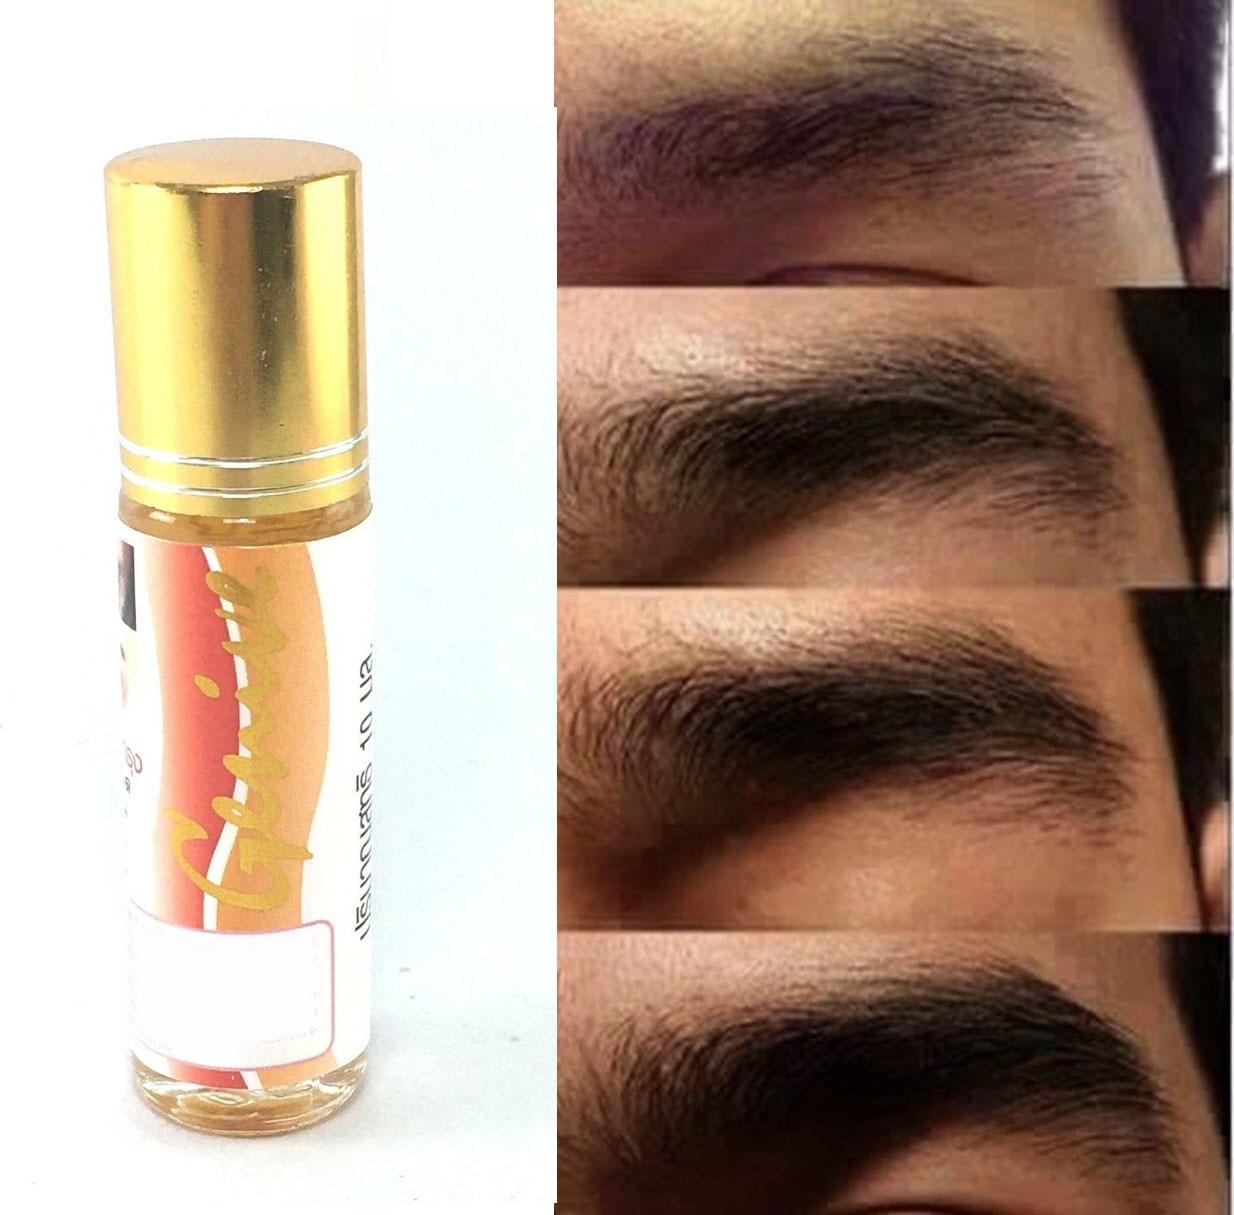 b01eb2f3c7e Genive Fast Hair Growth Serum Grow Your Beard Eyebrows Eyleashes 3 X Best  Faster Free Ship